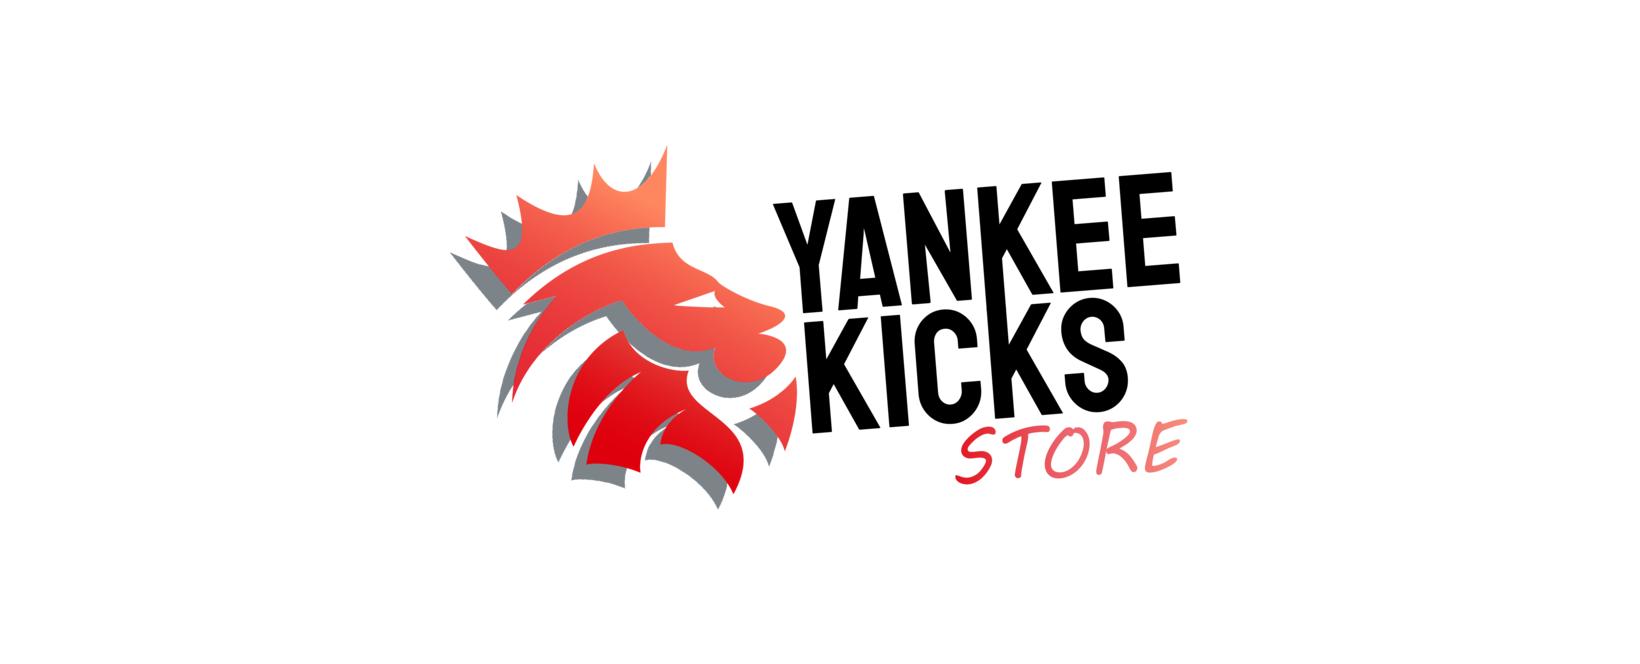 Yankee Kicks Discount Code 2021